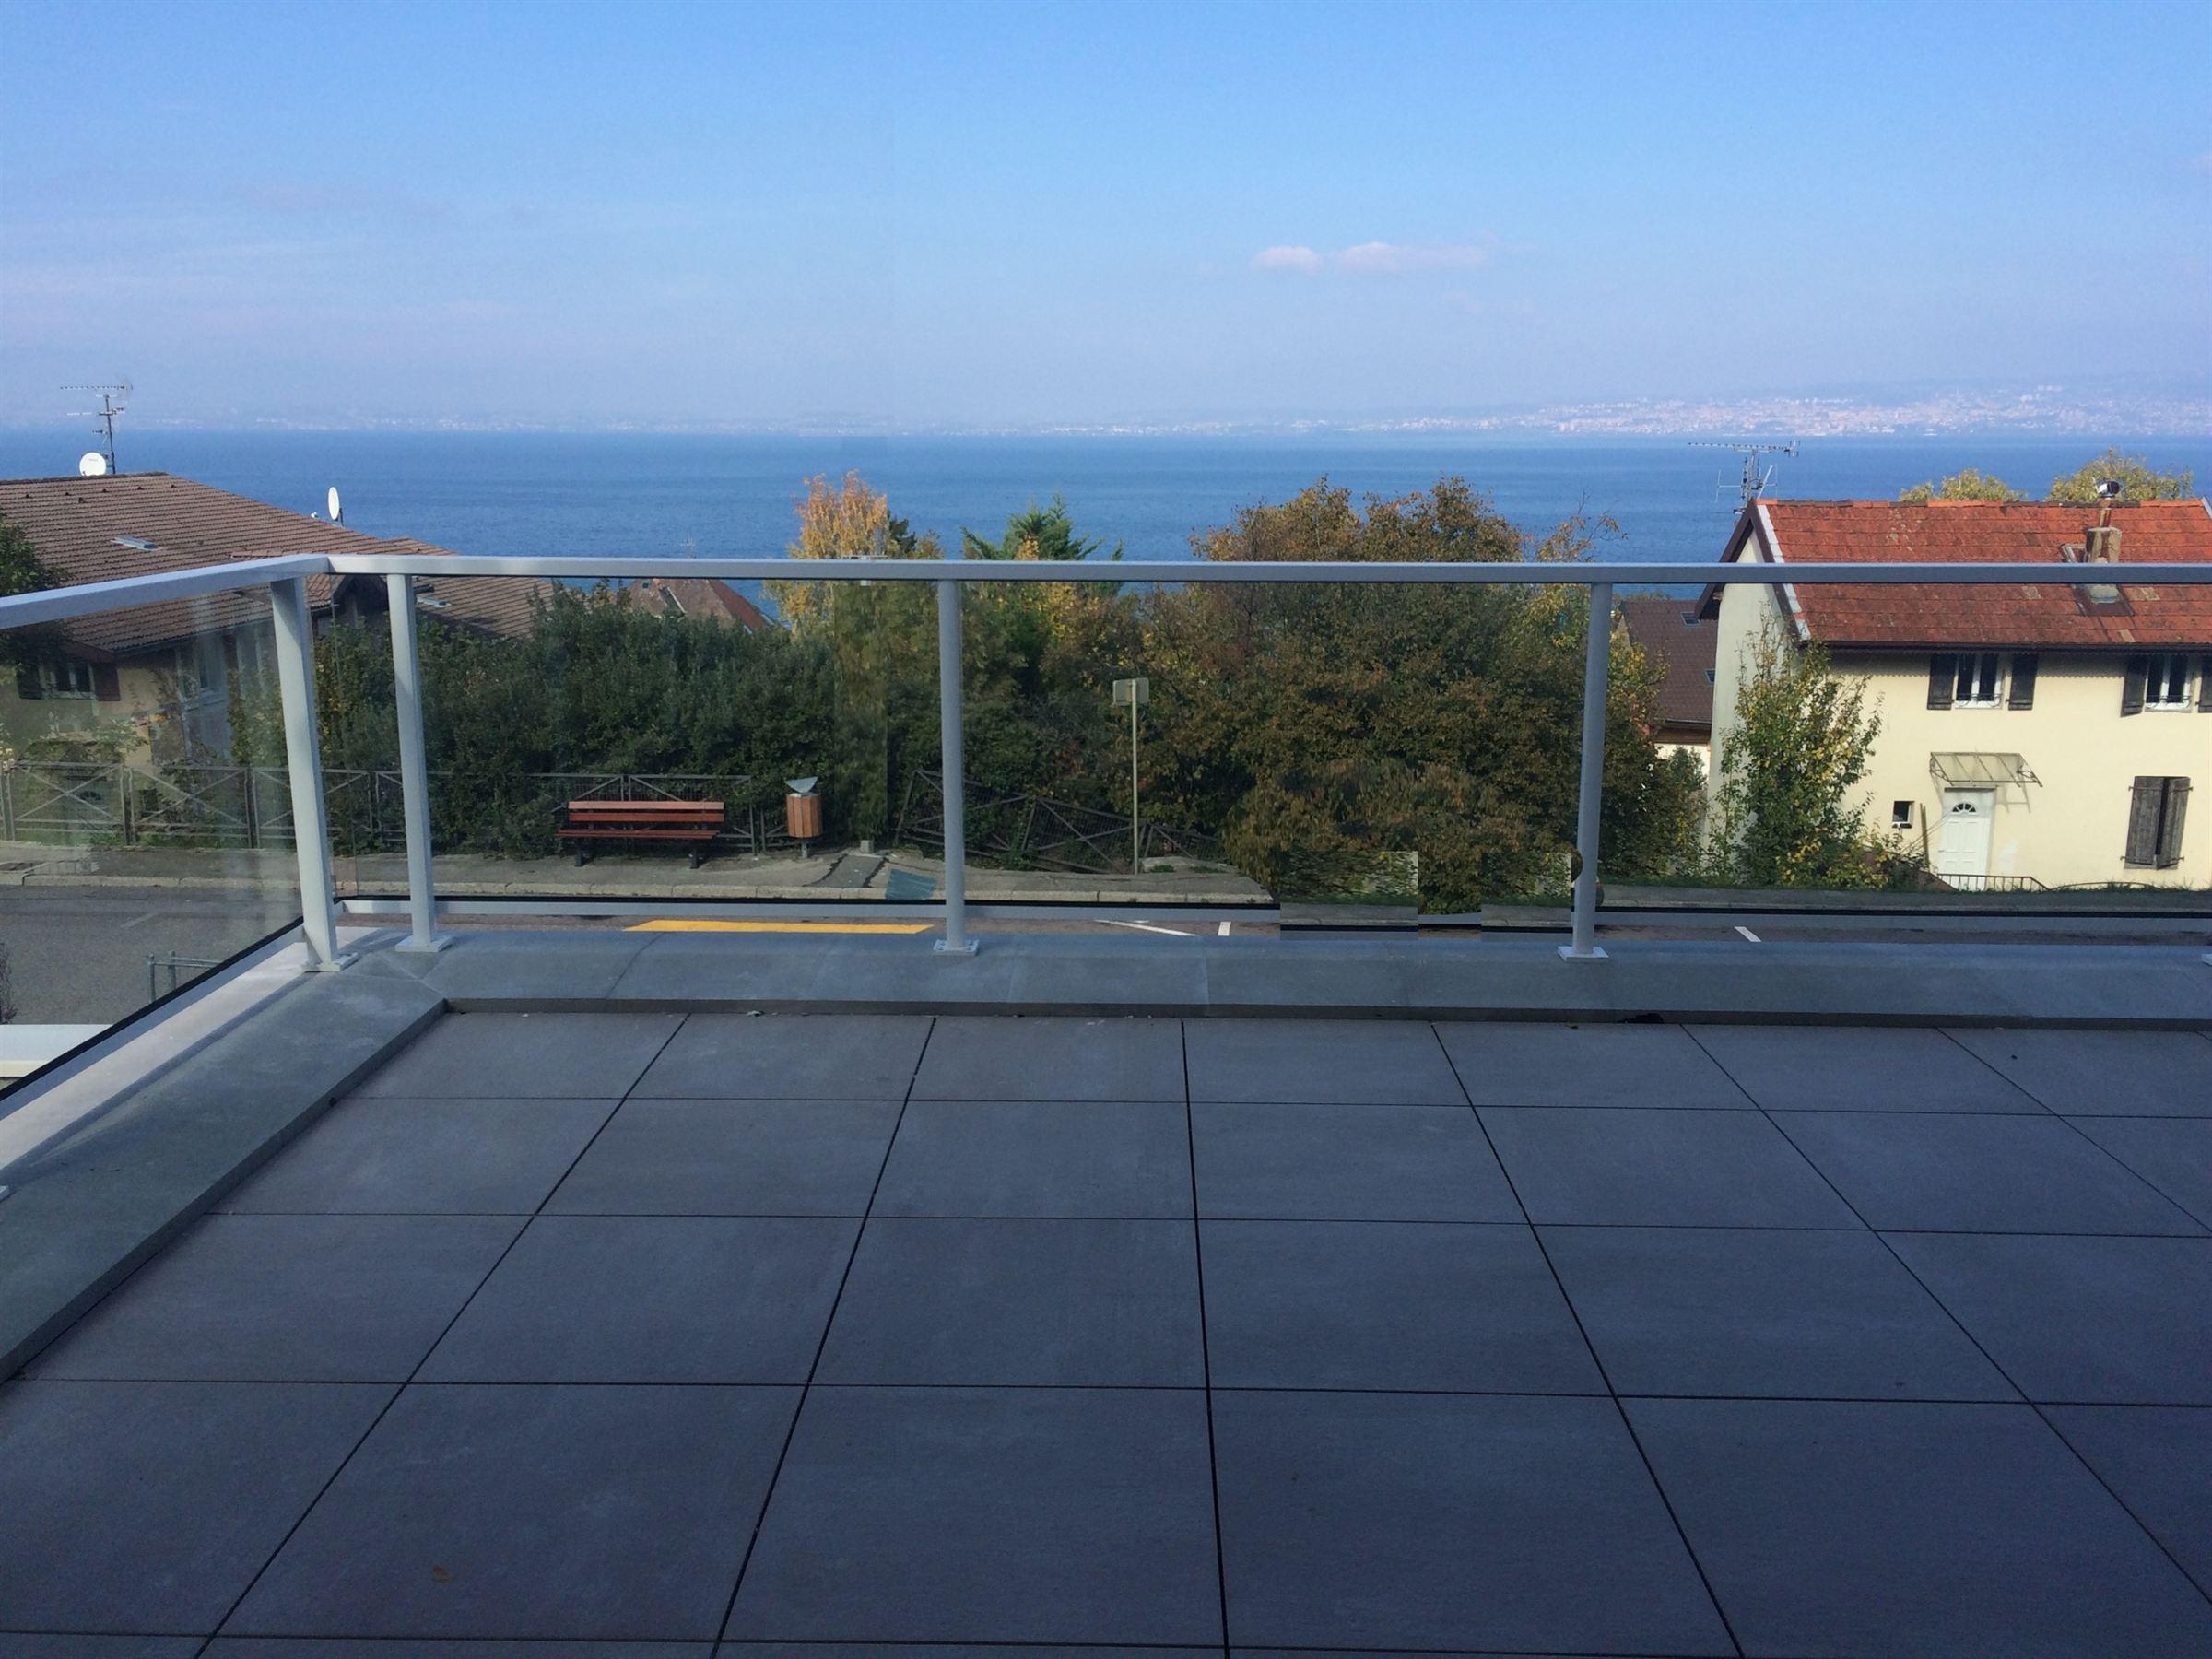 Apartamento por un Venta en EVIAN, NEW FLAT 3 BEDROOMS Evian Les Bains, Ródano-Alpes, 74500 Francia